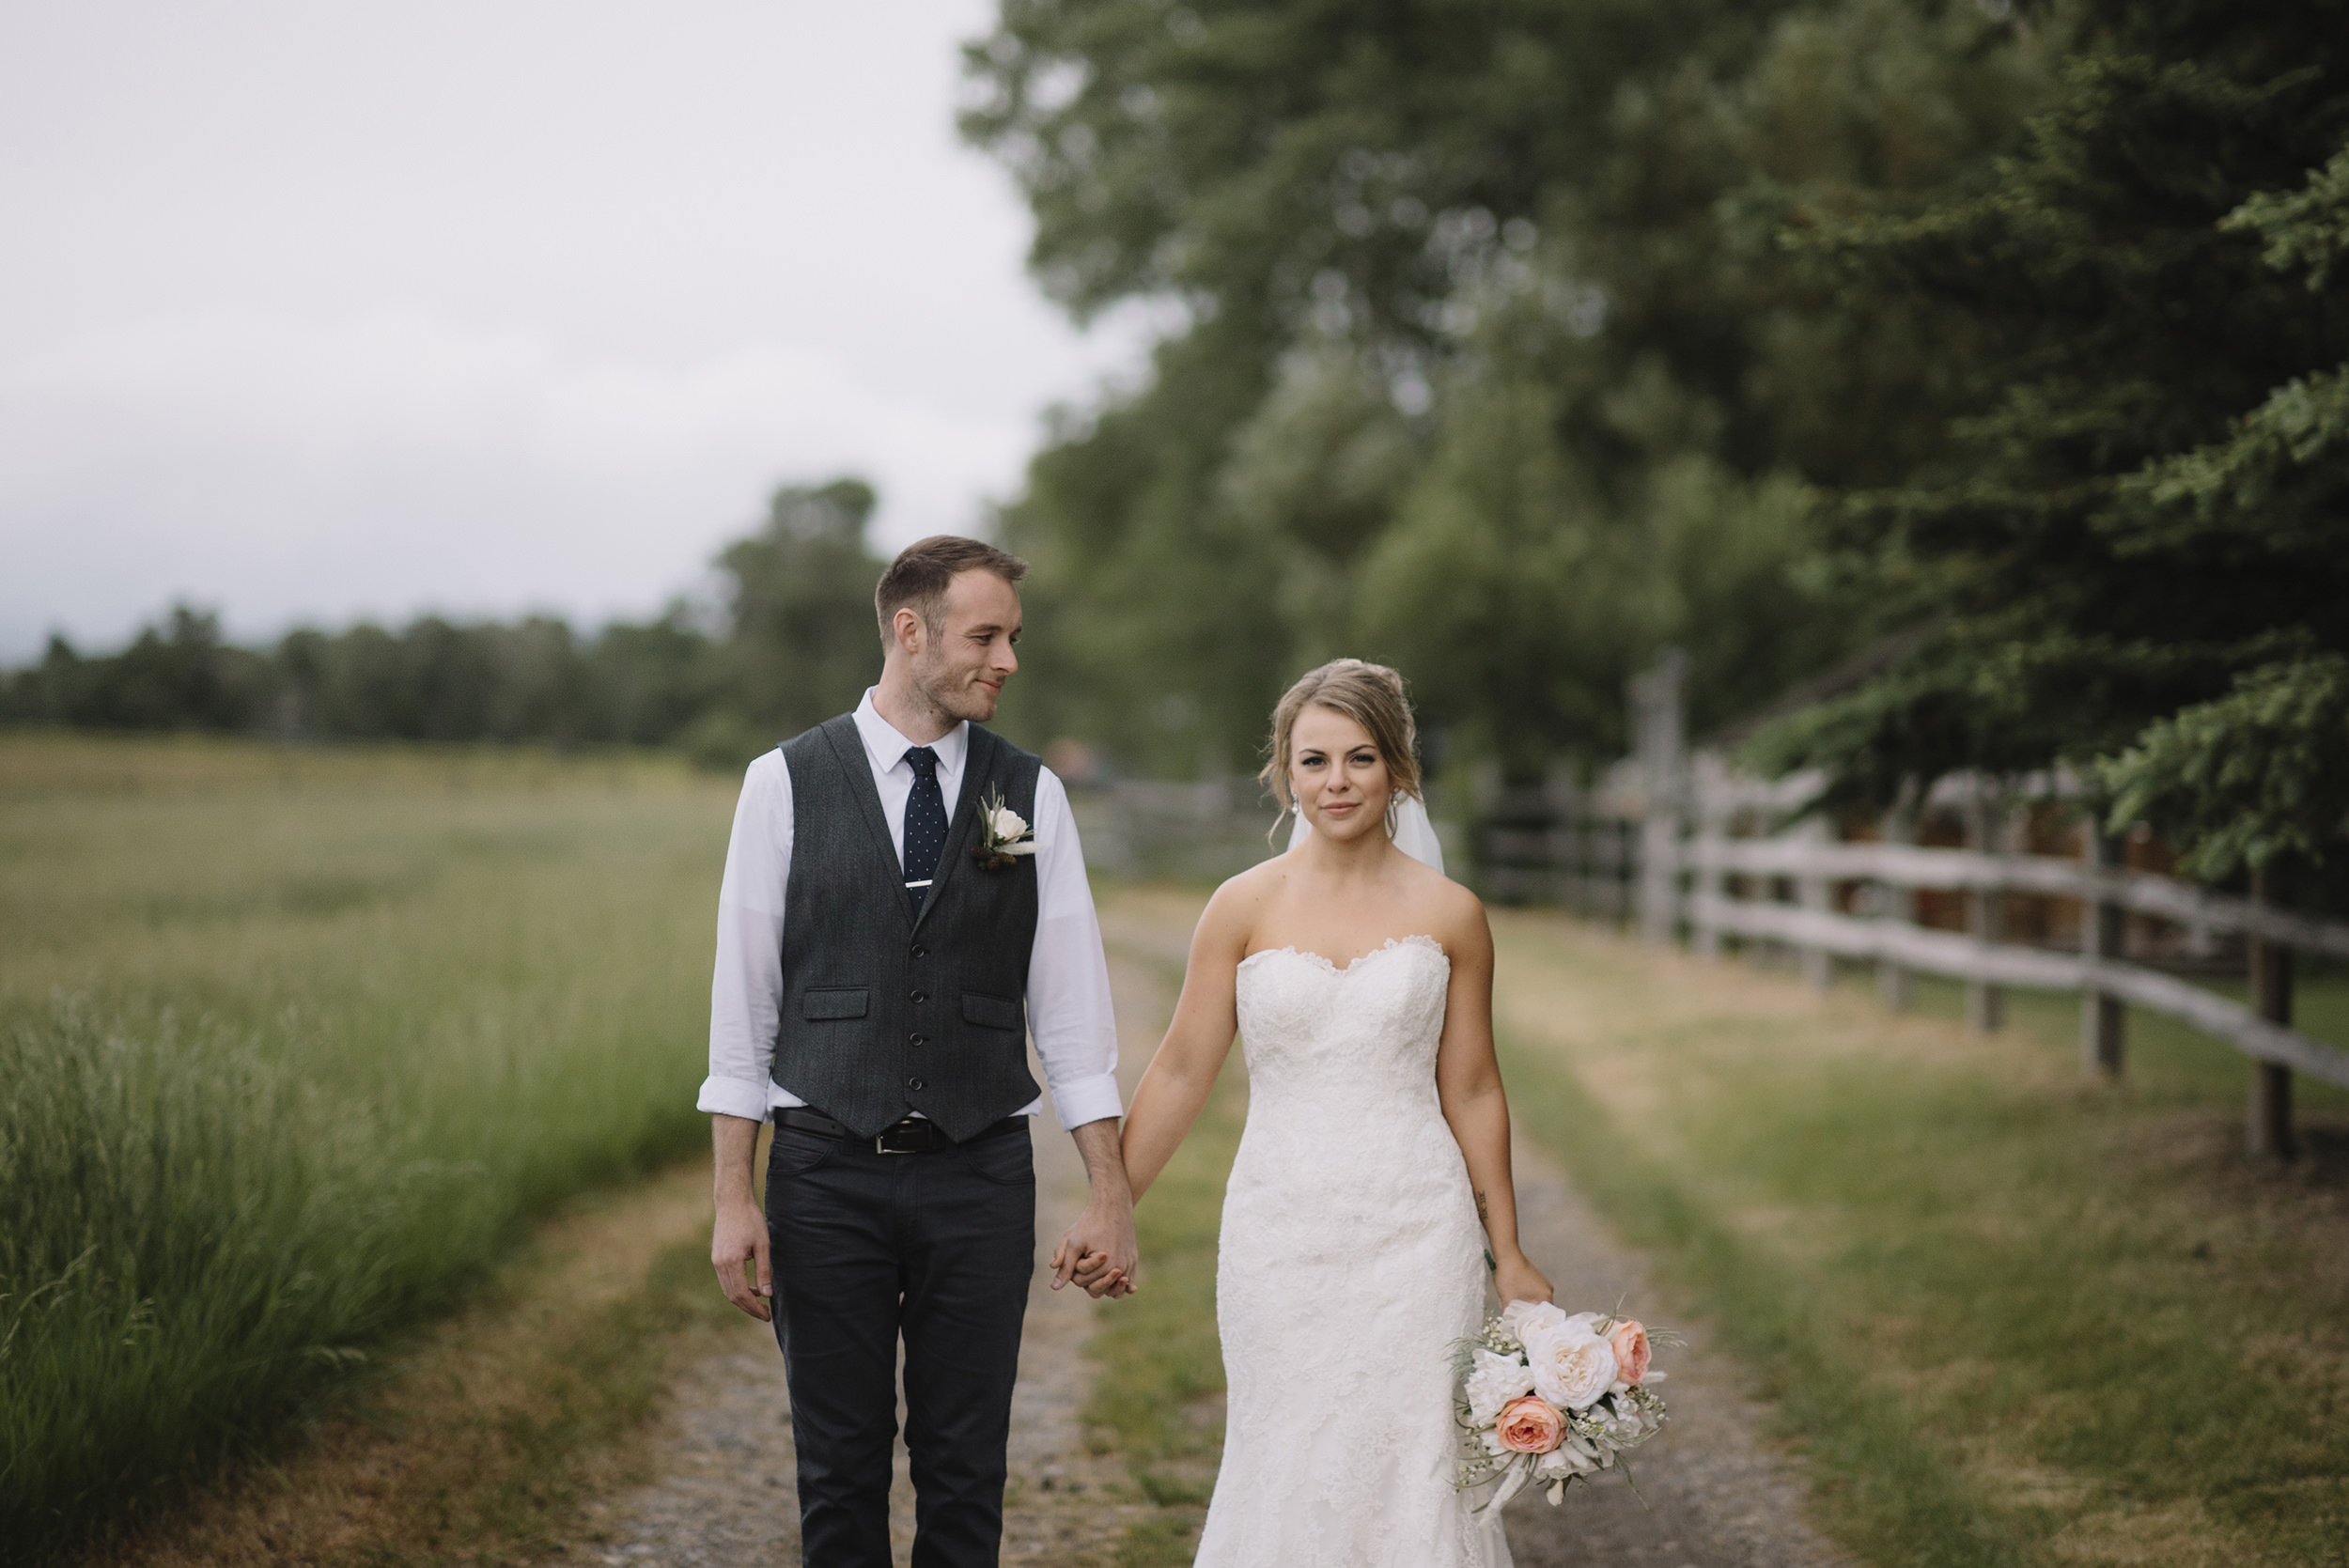 Colby-and-Jess-Intimate-Backyard-Wedding-Bozeman-Montana269.jpg